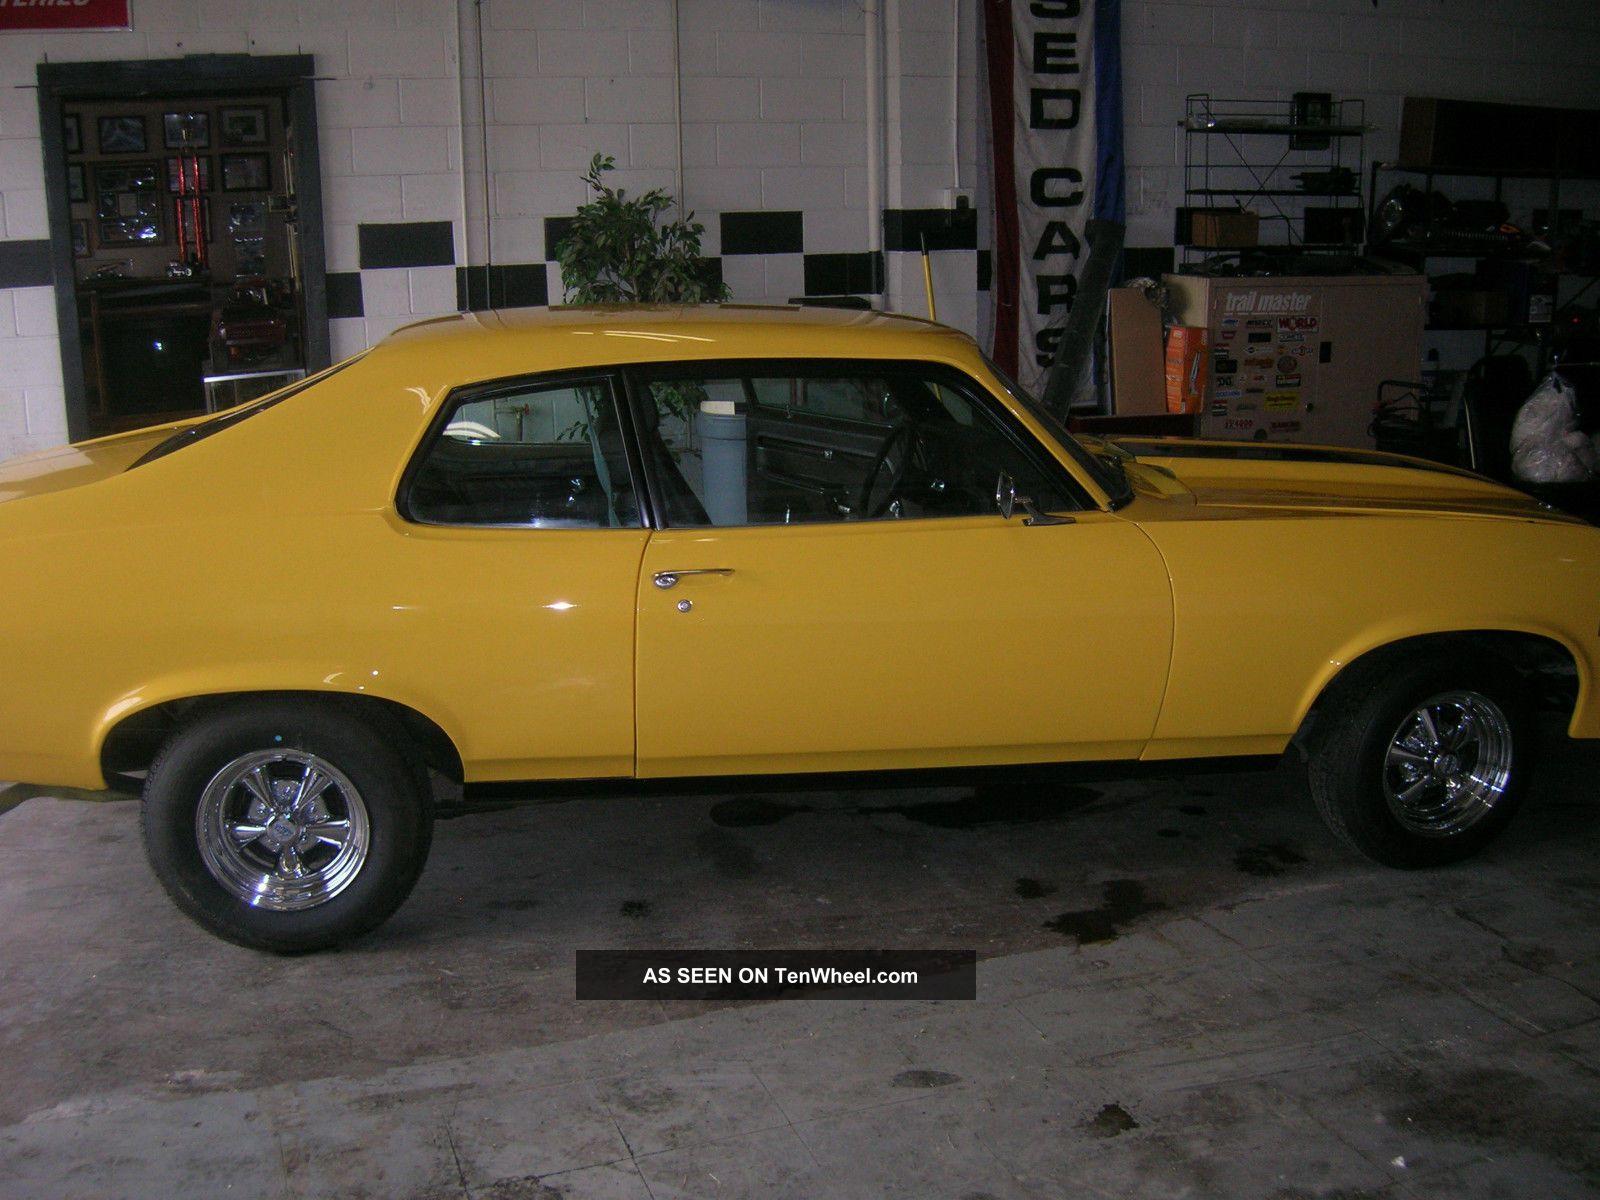 Chevrolet Nova 1974 2 Door Coupe Last Time To Be Listed On Ebay Nova photo